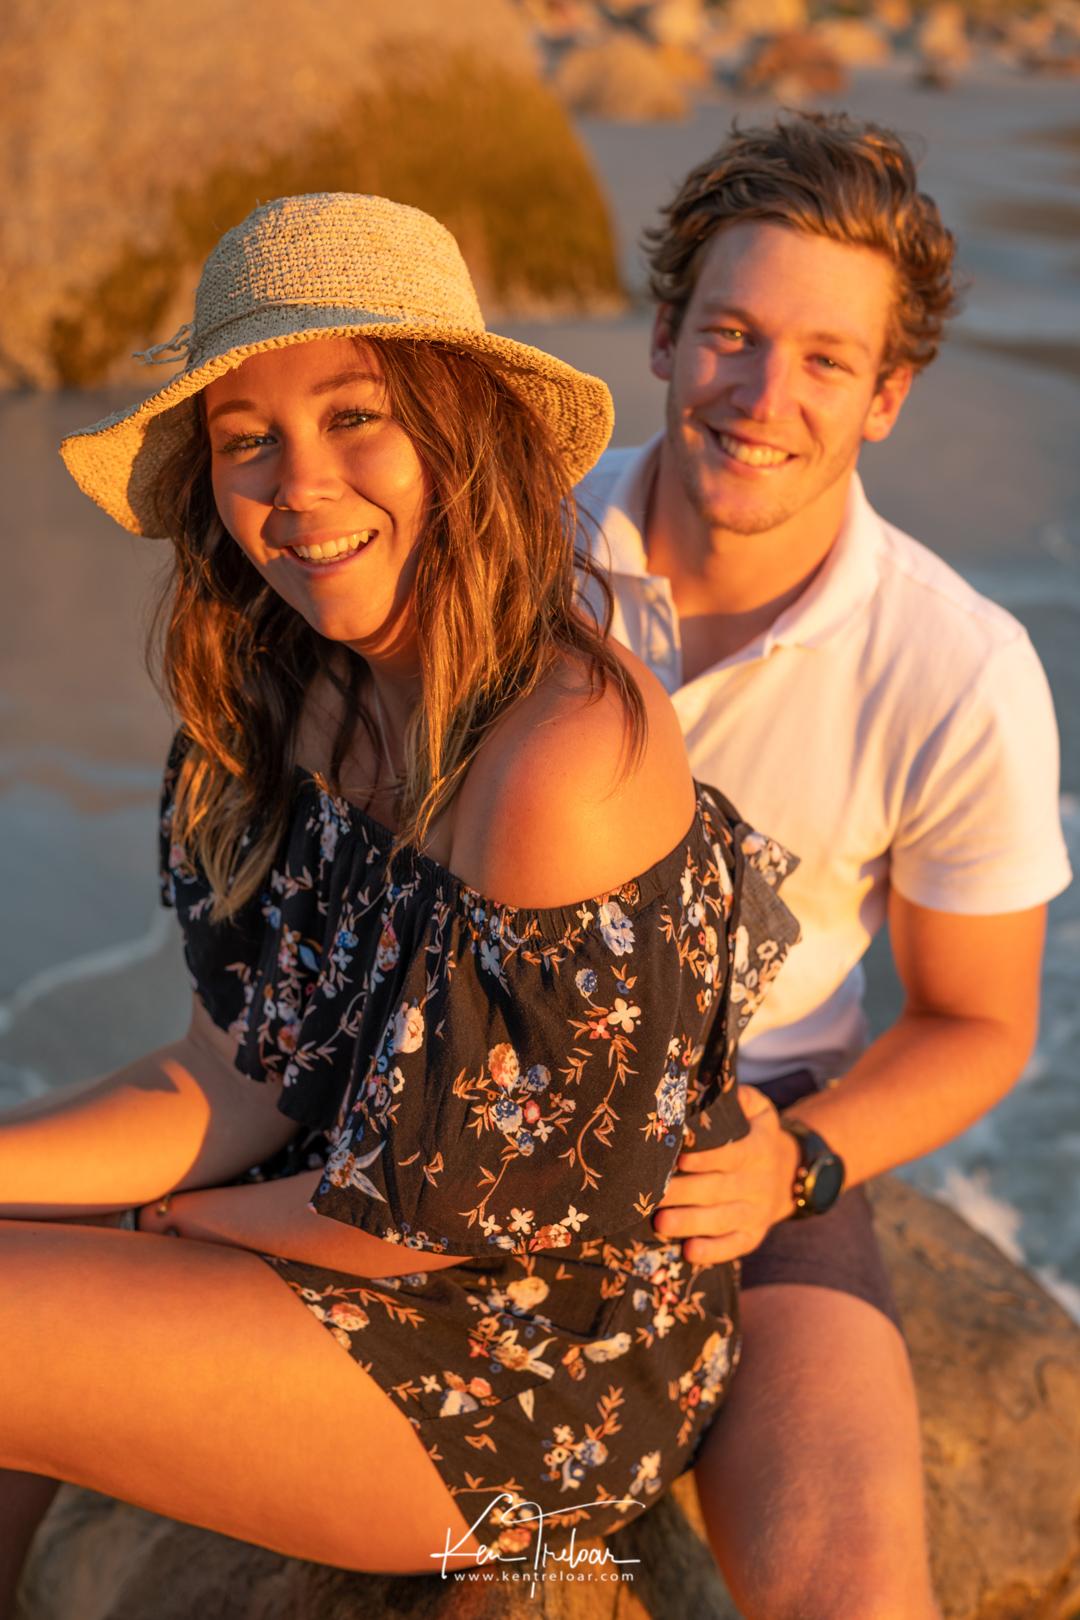 Ken Treloar Photography - _Llandudno_Sunset Couples Session 2019-1.jpg